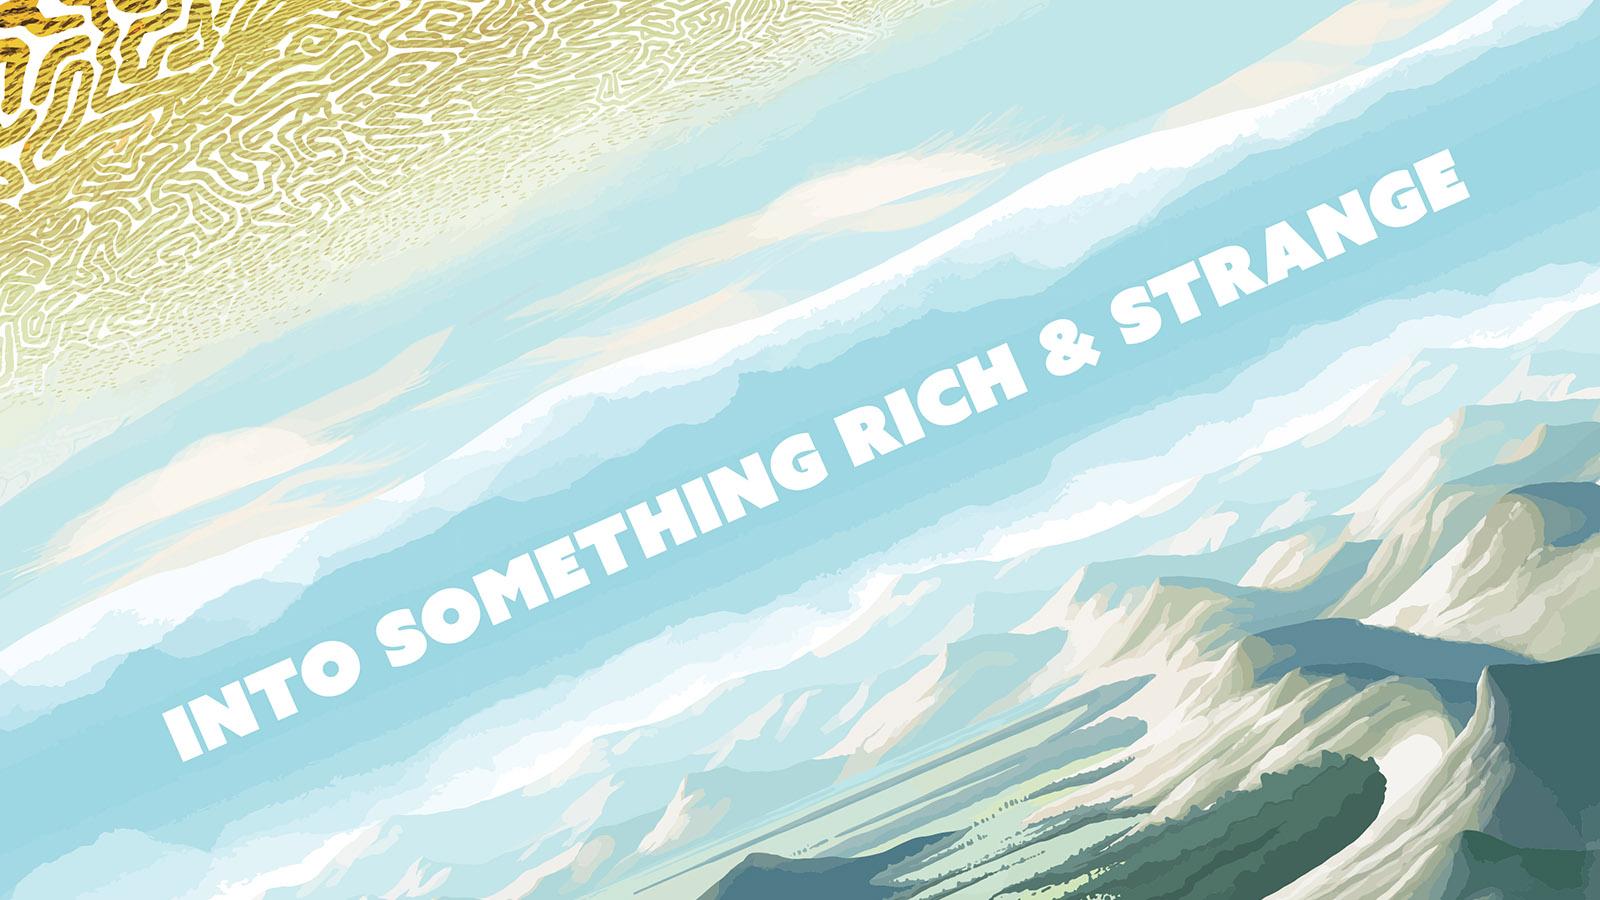 artsweek 2018 - Into Something Rich and Strange